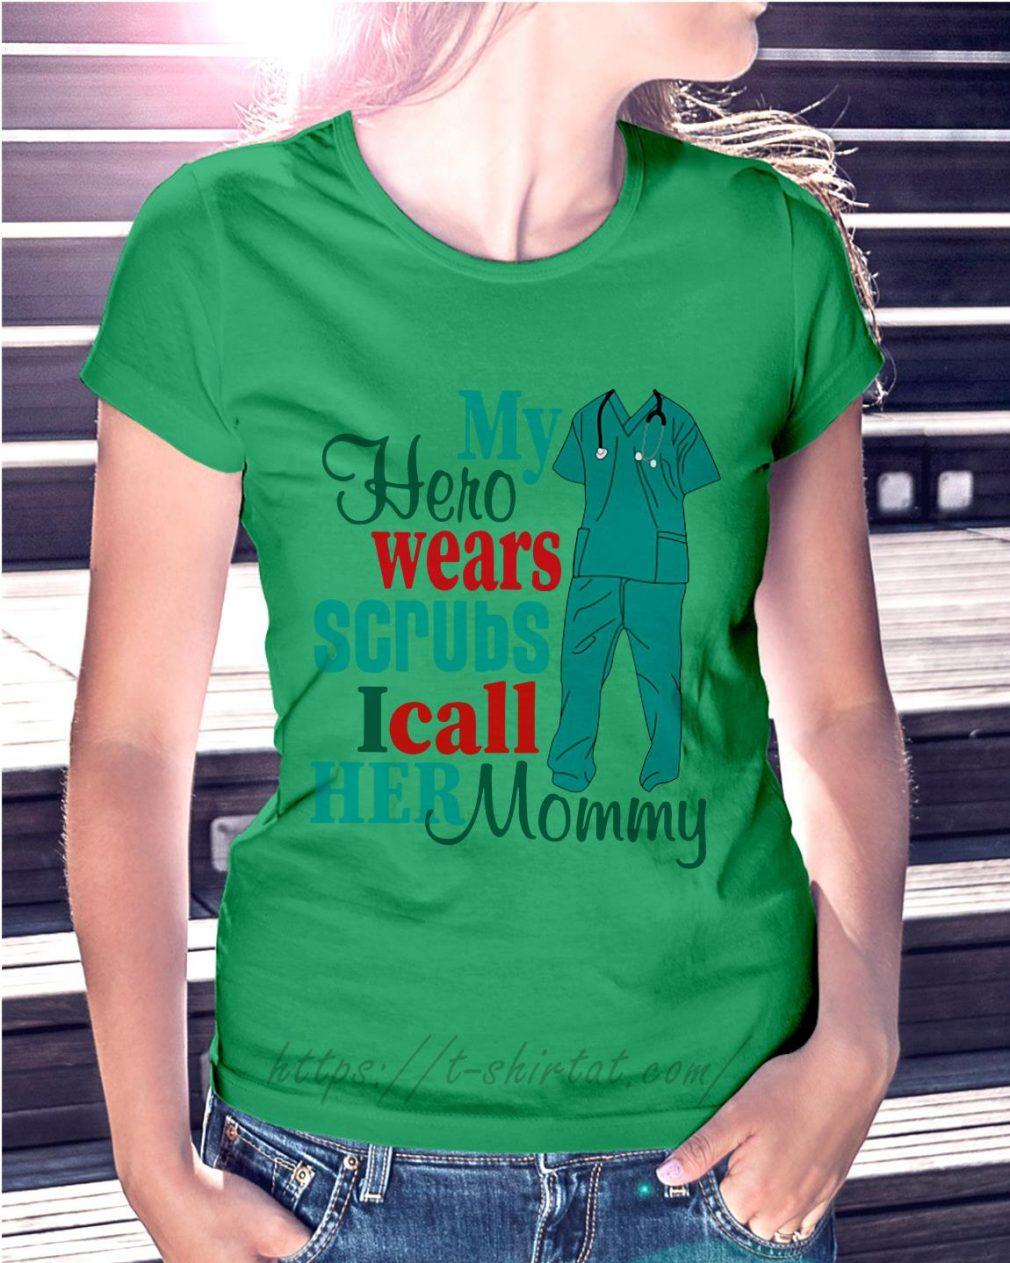 Nurse my hero wears scrubs I call her mommy Ladies Tee green